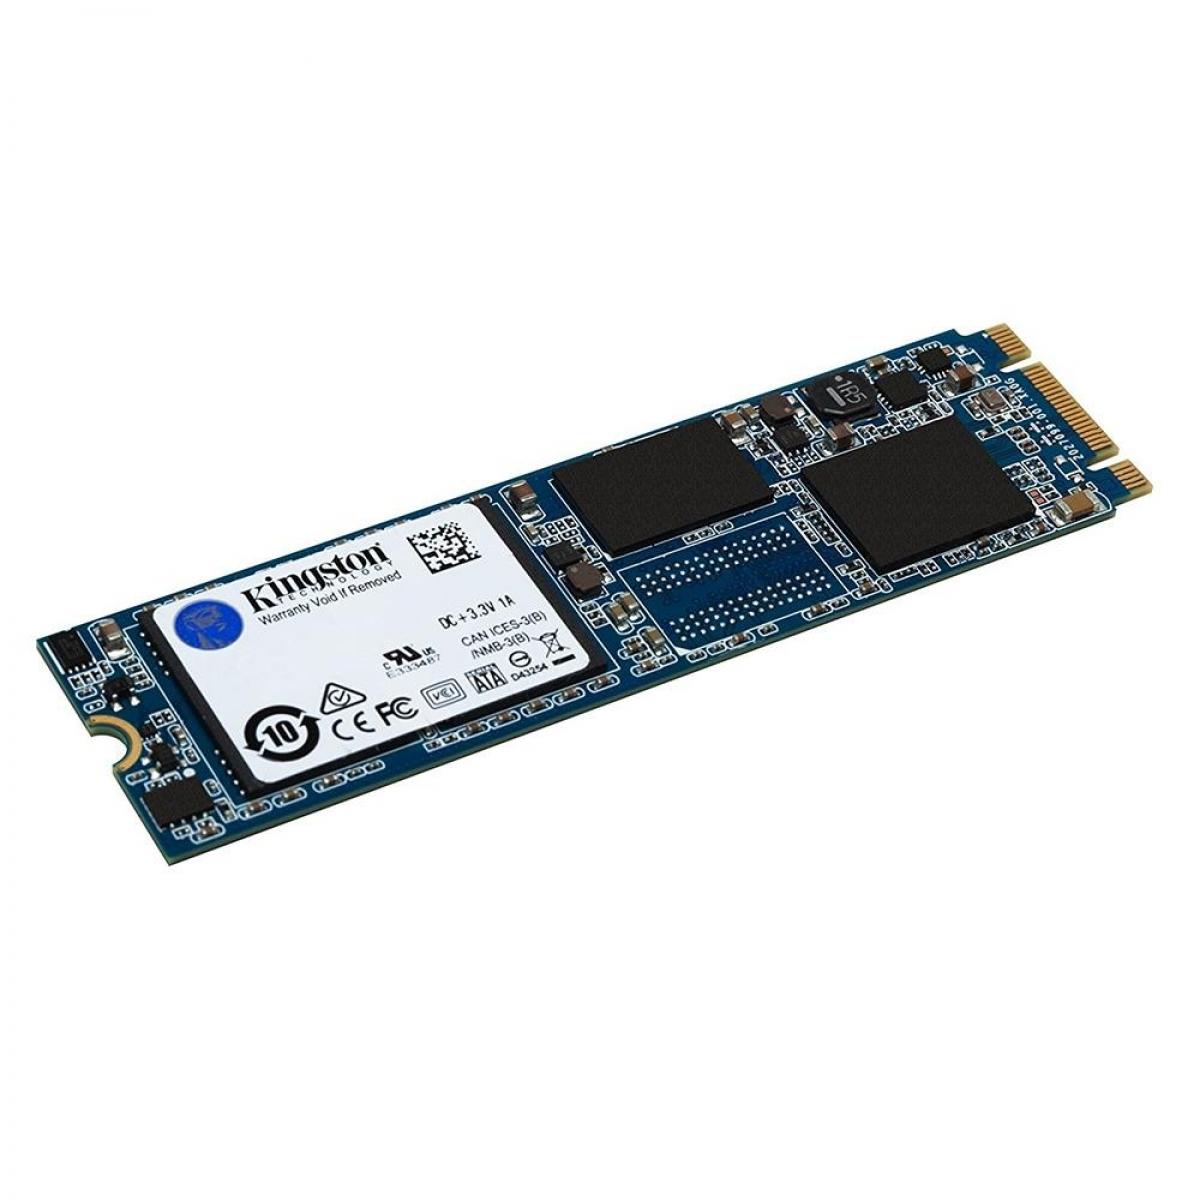 SSD Kingston UV500, 960GB, M.2 2280, NVMe, Leitura 520MBs e Gravação 500MBs, SUV500M8/960G